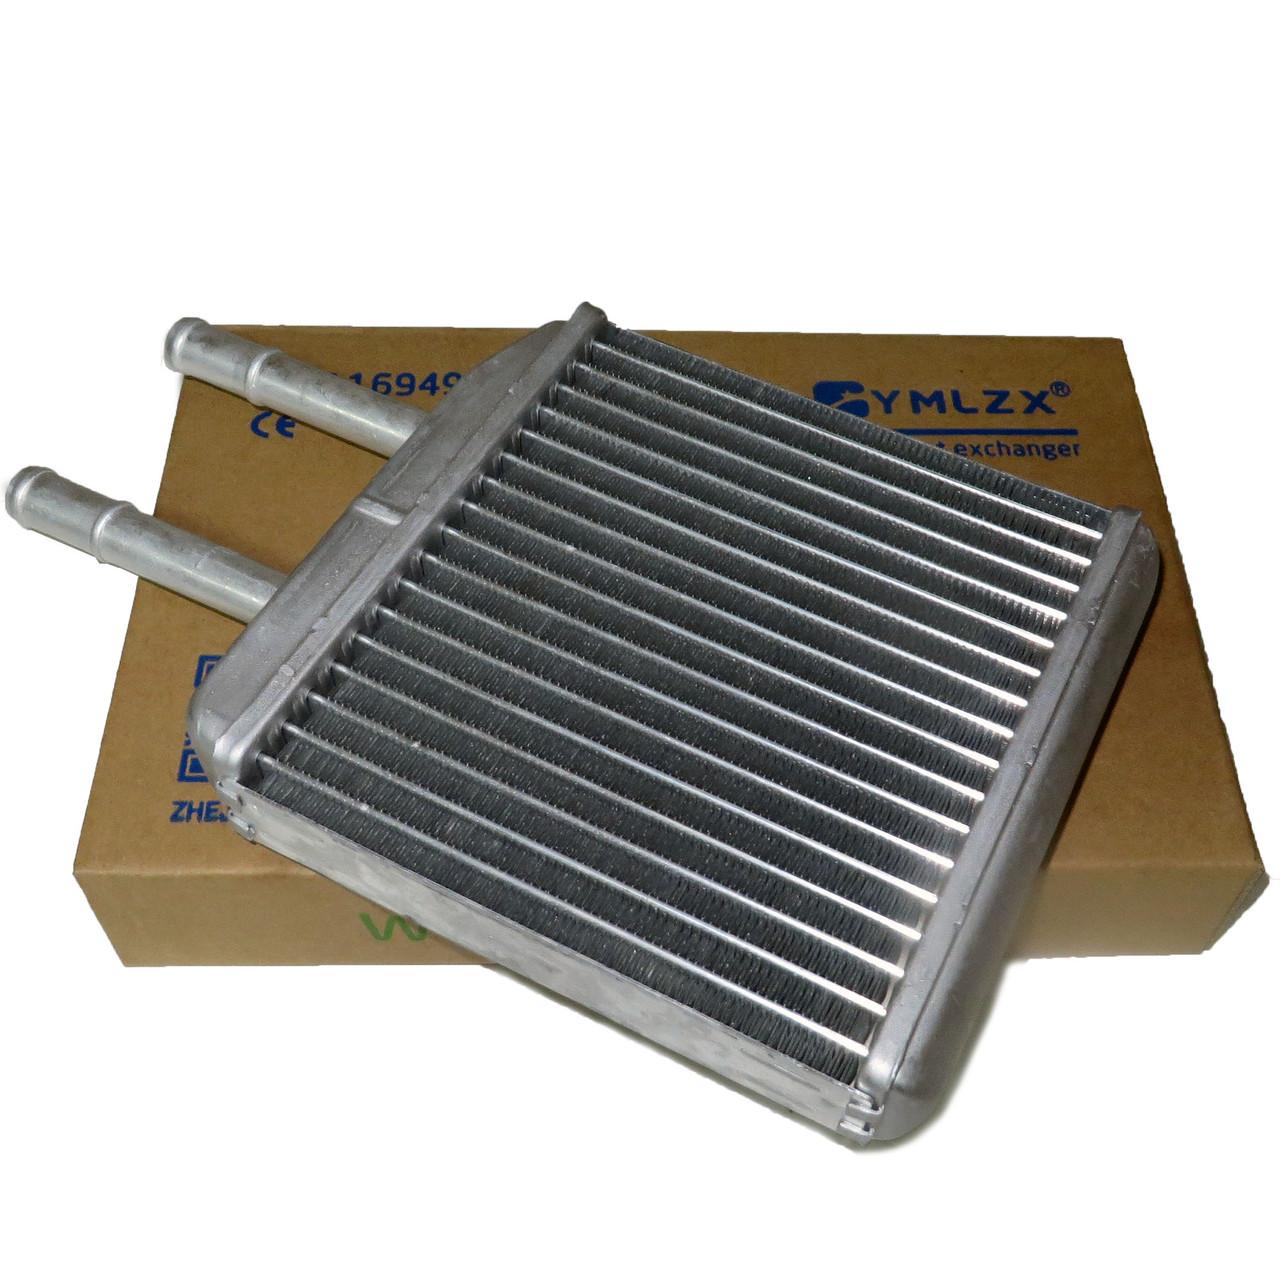 Радиатор печки Матиз, YMLZX, YML-BH-140, 96314858-